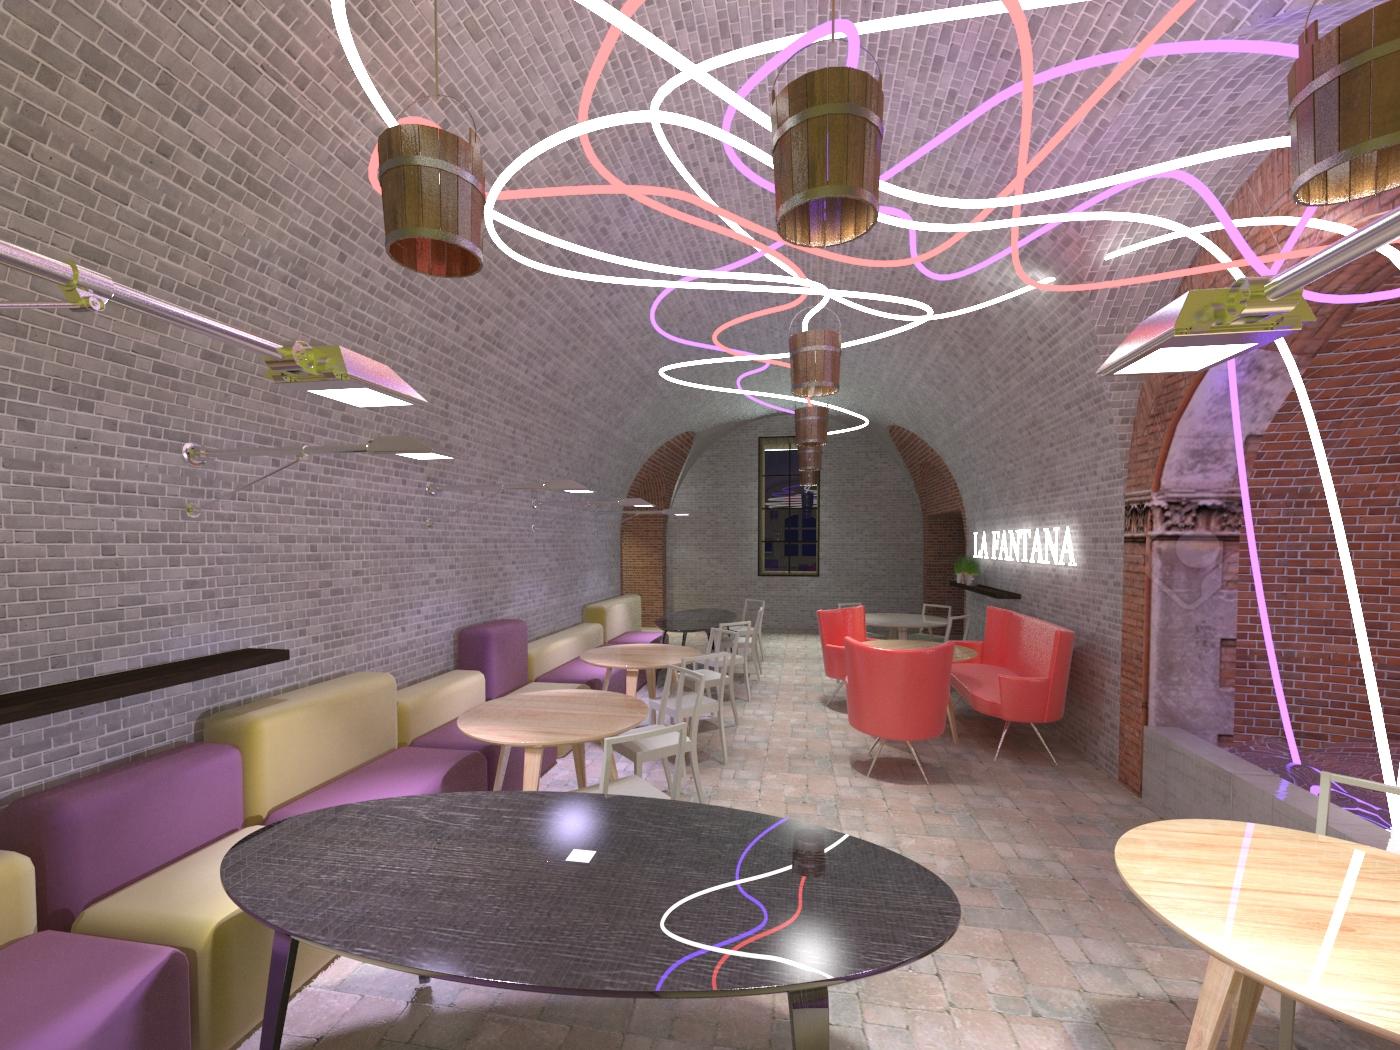 https://nbc-arhitect.ro/wp-content/uploads/2020/10/NBC-Arhitect-_-Ryma-Club-_-Alba-Iulia-Romania-_-interior-design-view_4.jpg